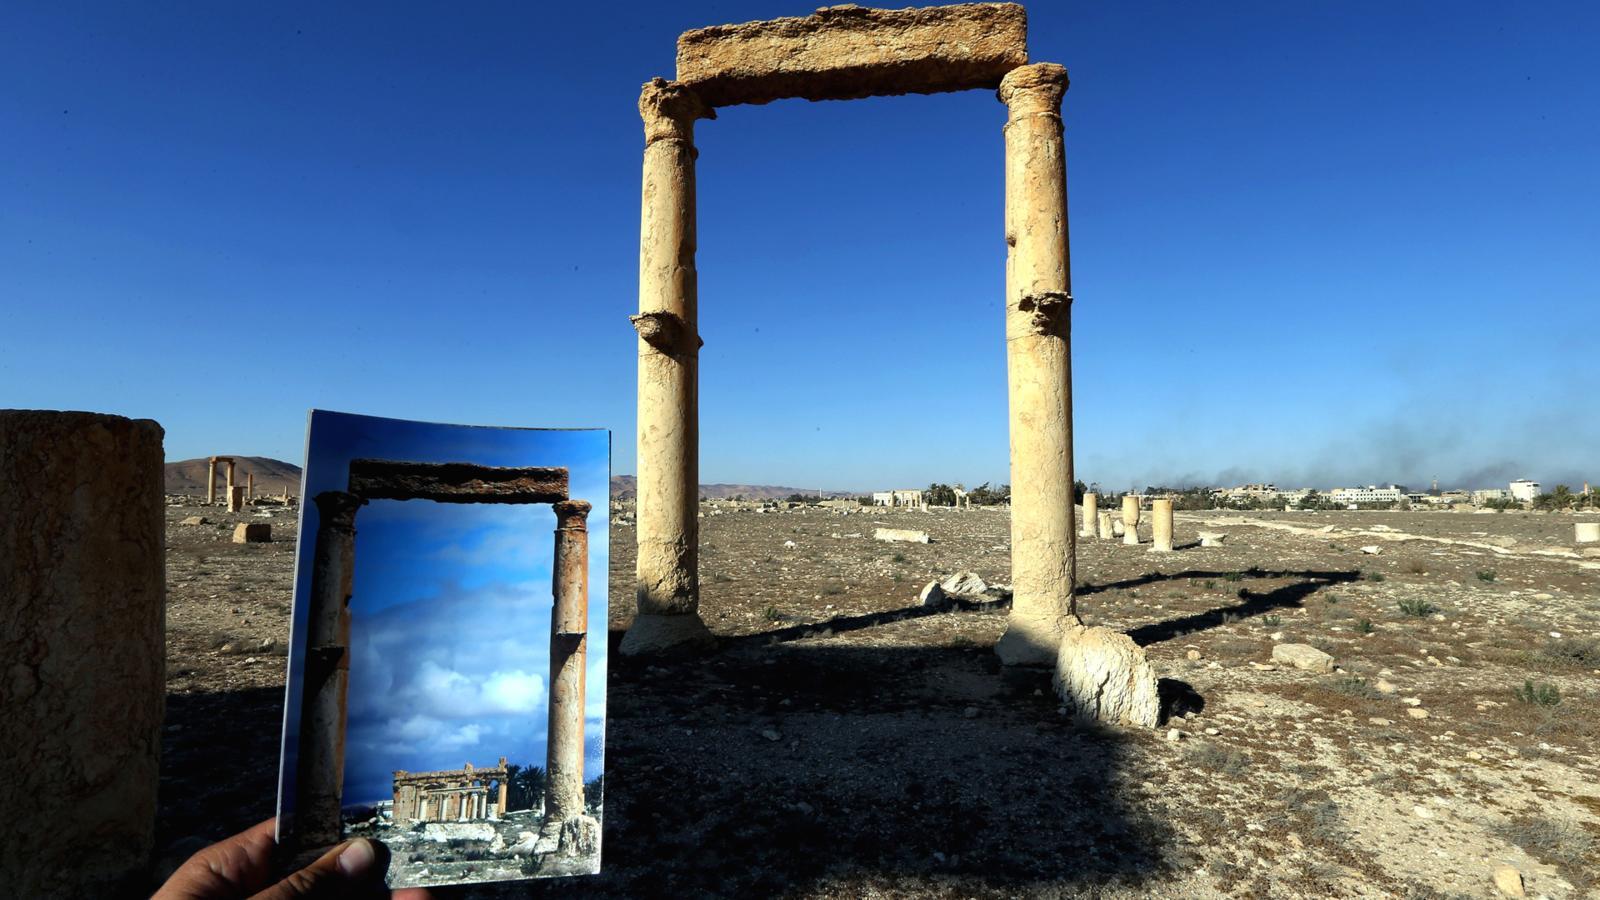 003 - SYRIA-CONFLICT-HERITAGE-PALMYRA